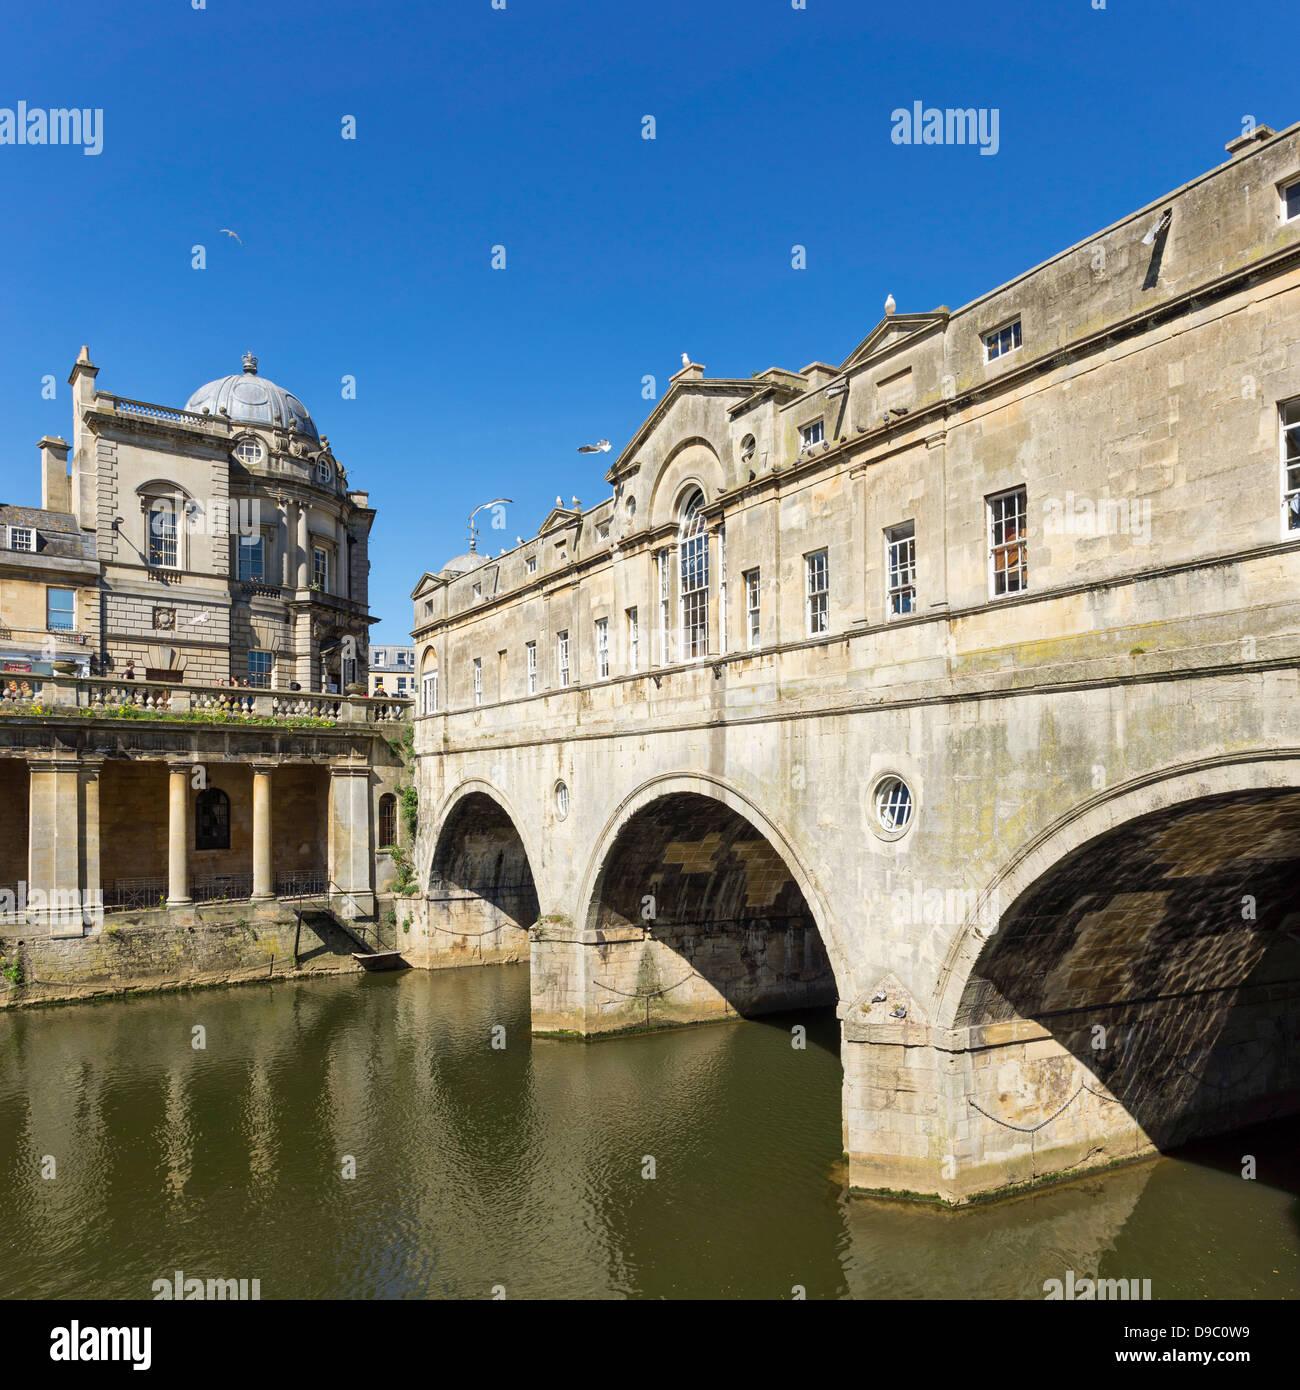 Pulteney Bridge, Bath, England, UK Stockbild